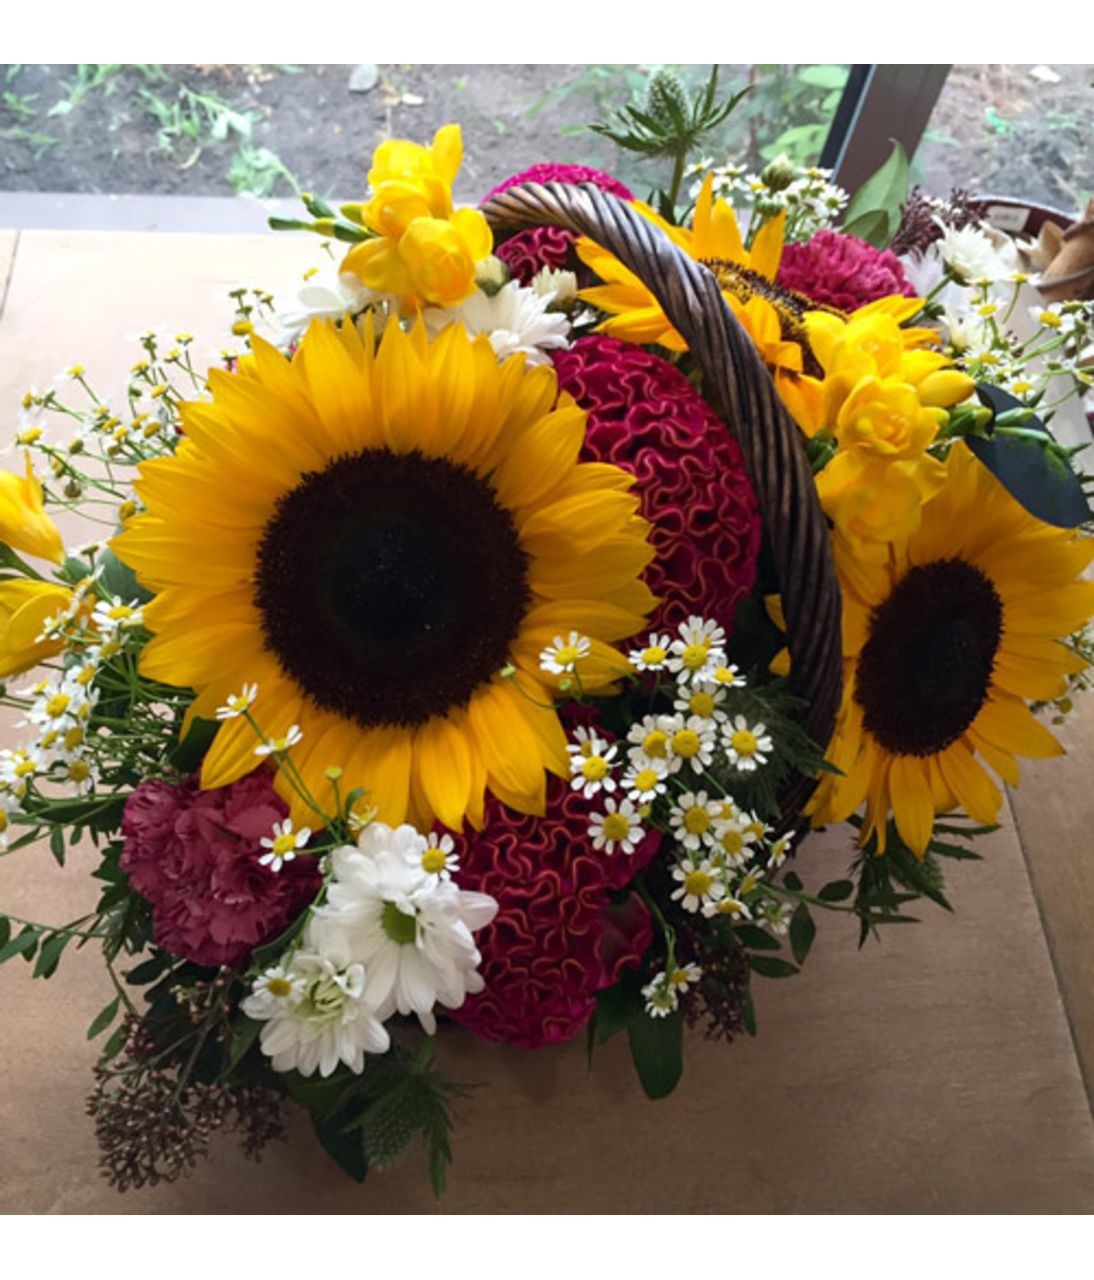 "Корзина цветов с подсолнухами ""Лучик"". Superflowers.com.ua"